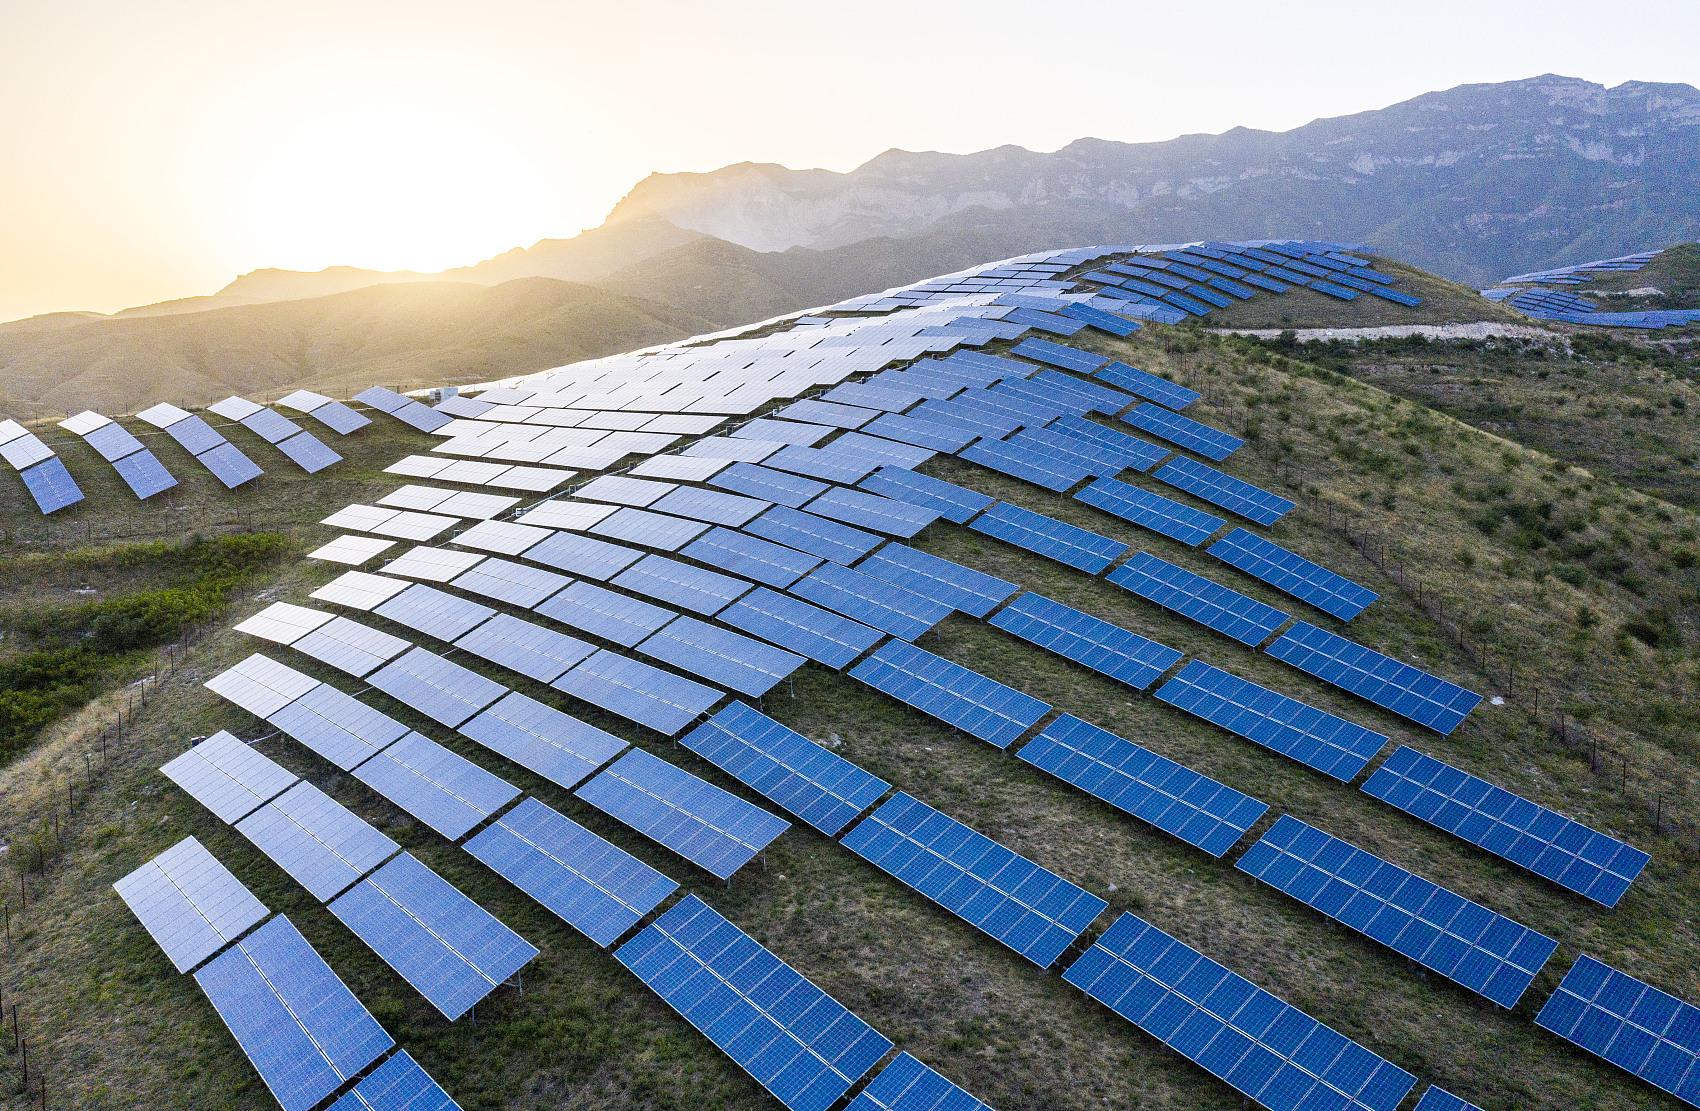 Clean energy development to accelerate in post-pandemic era: LONGi founder